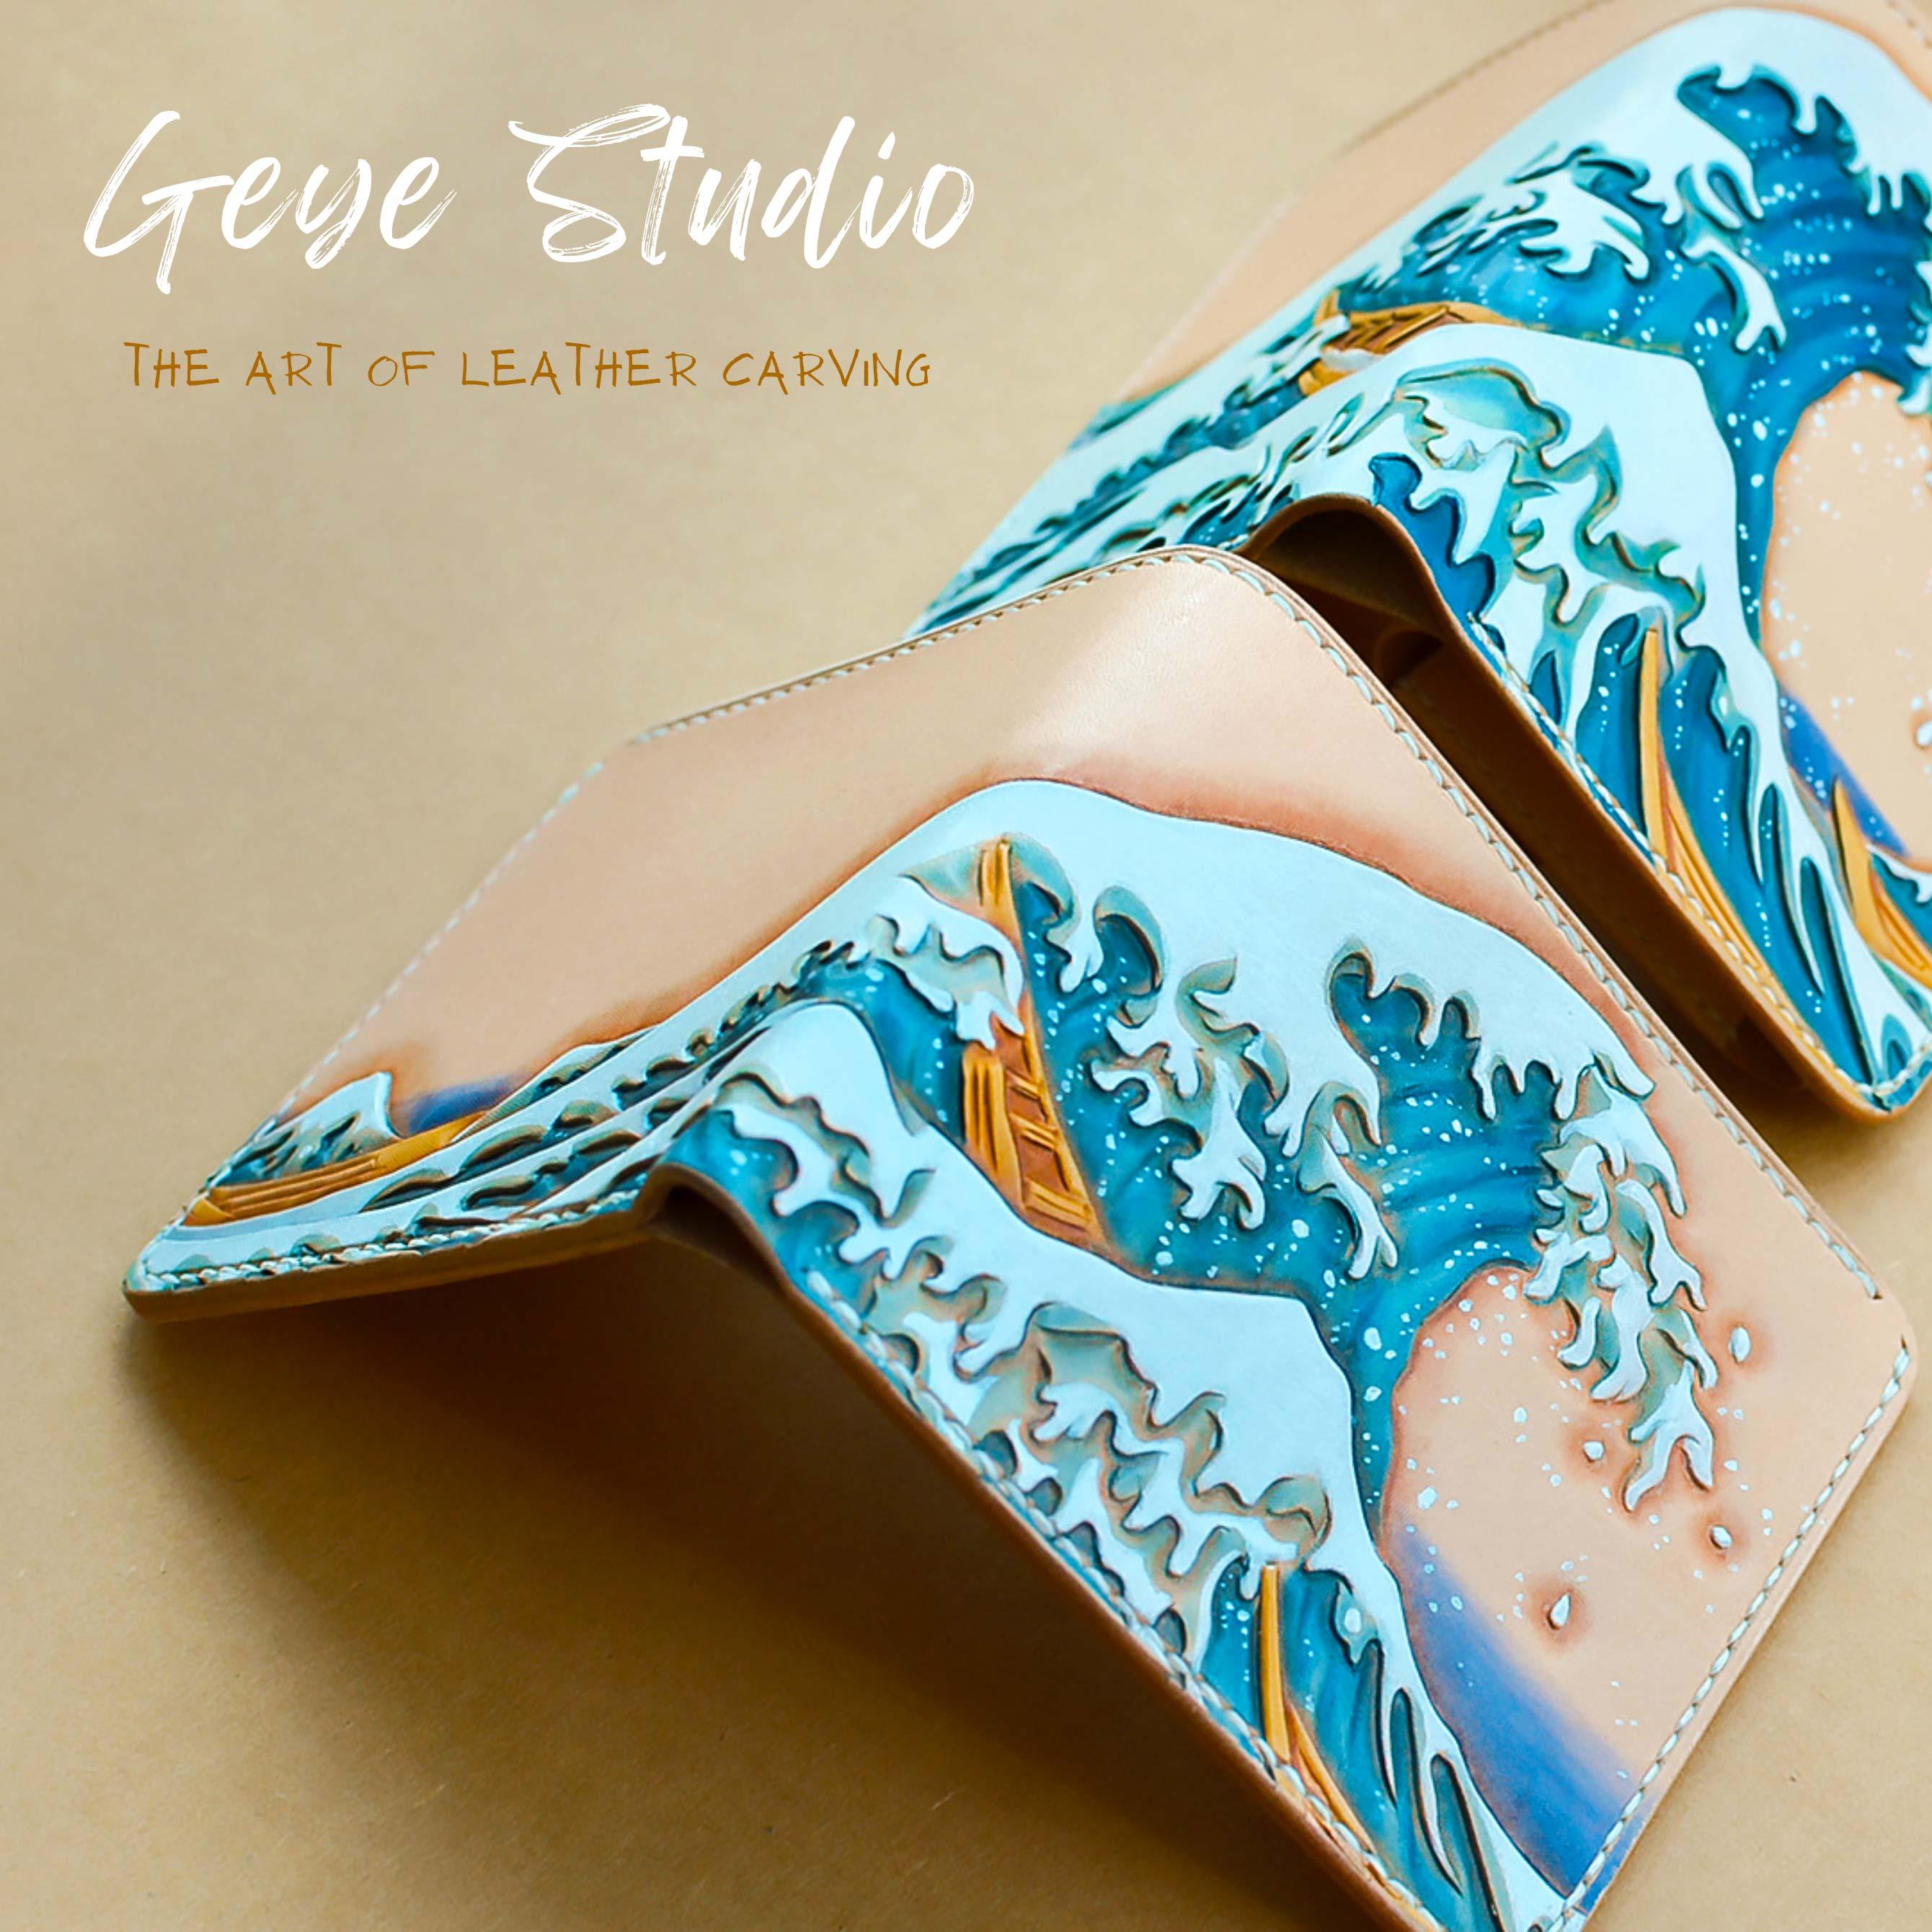 Craft skills